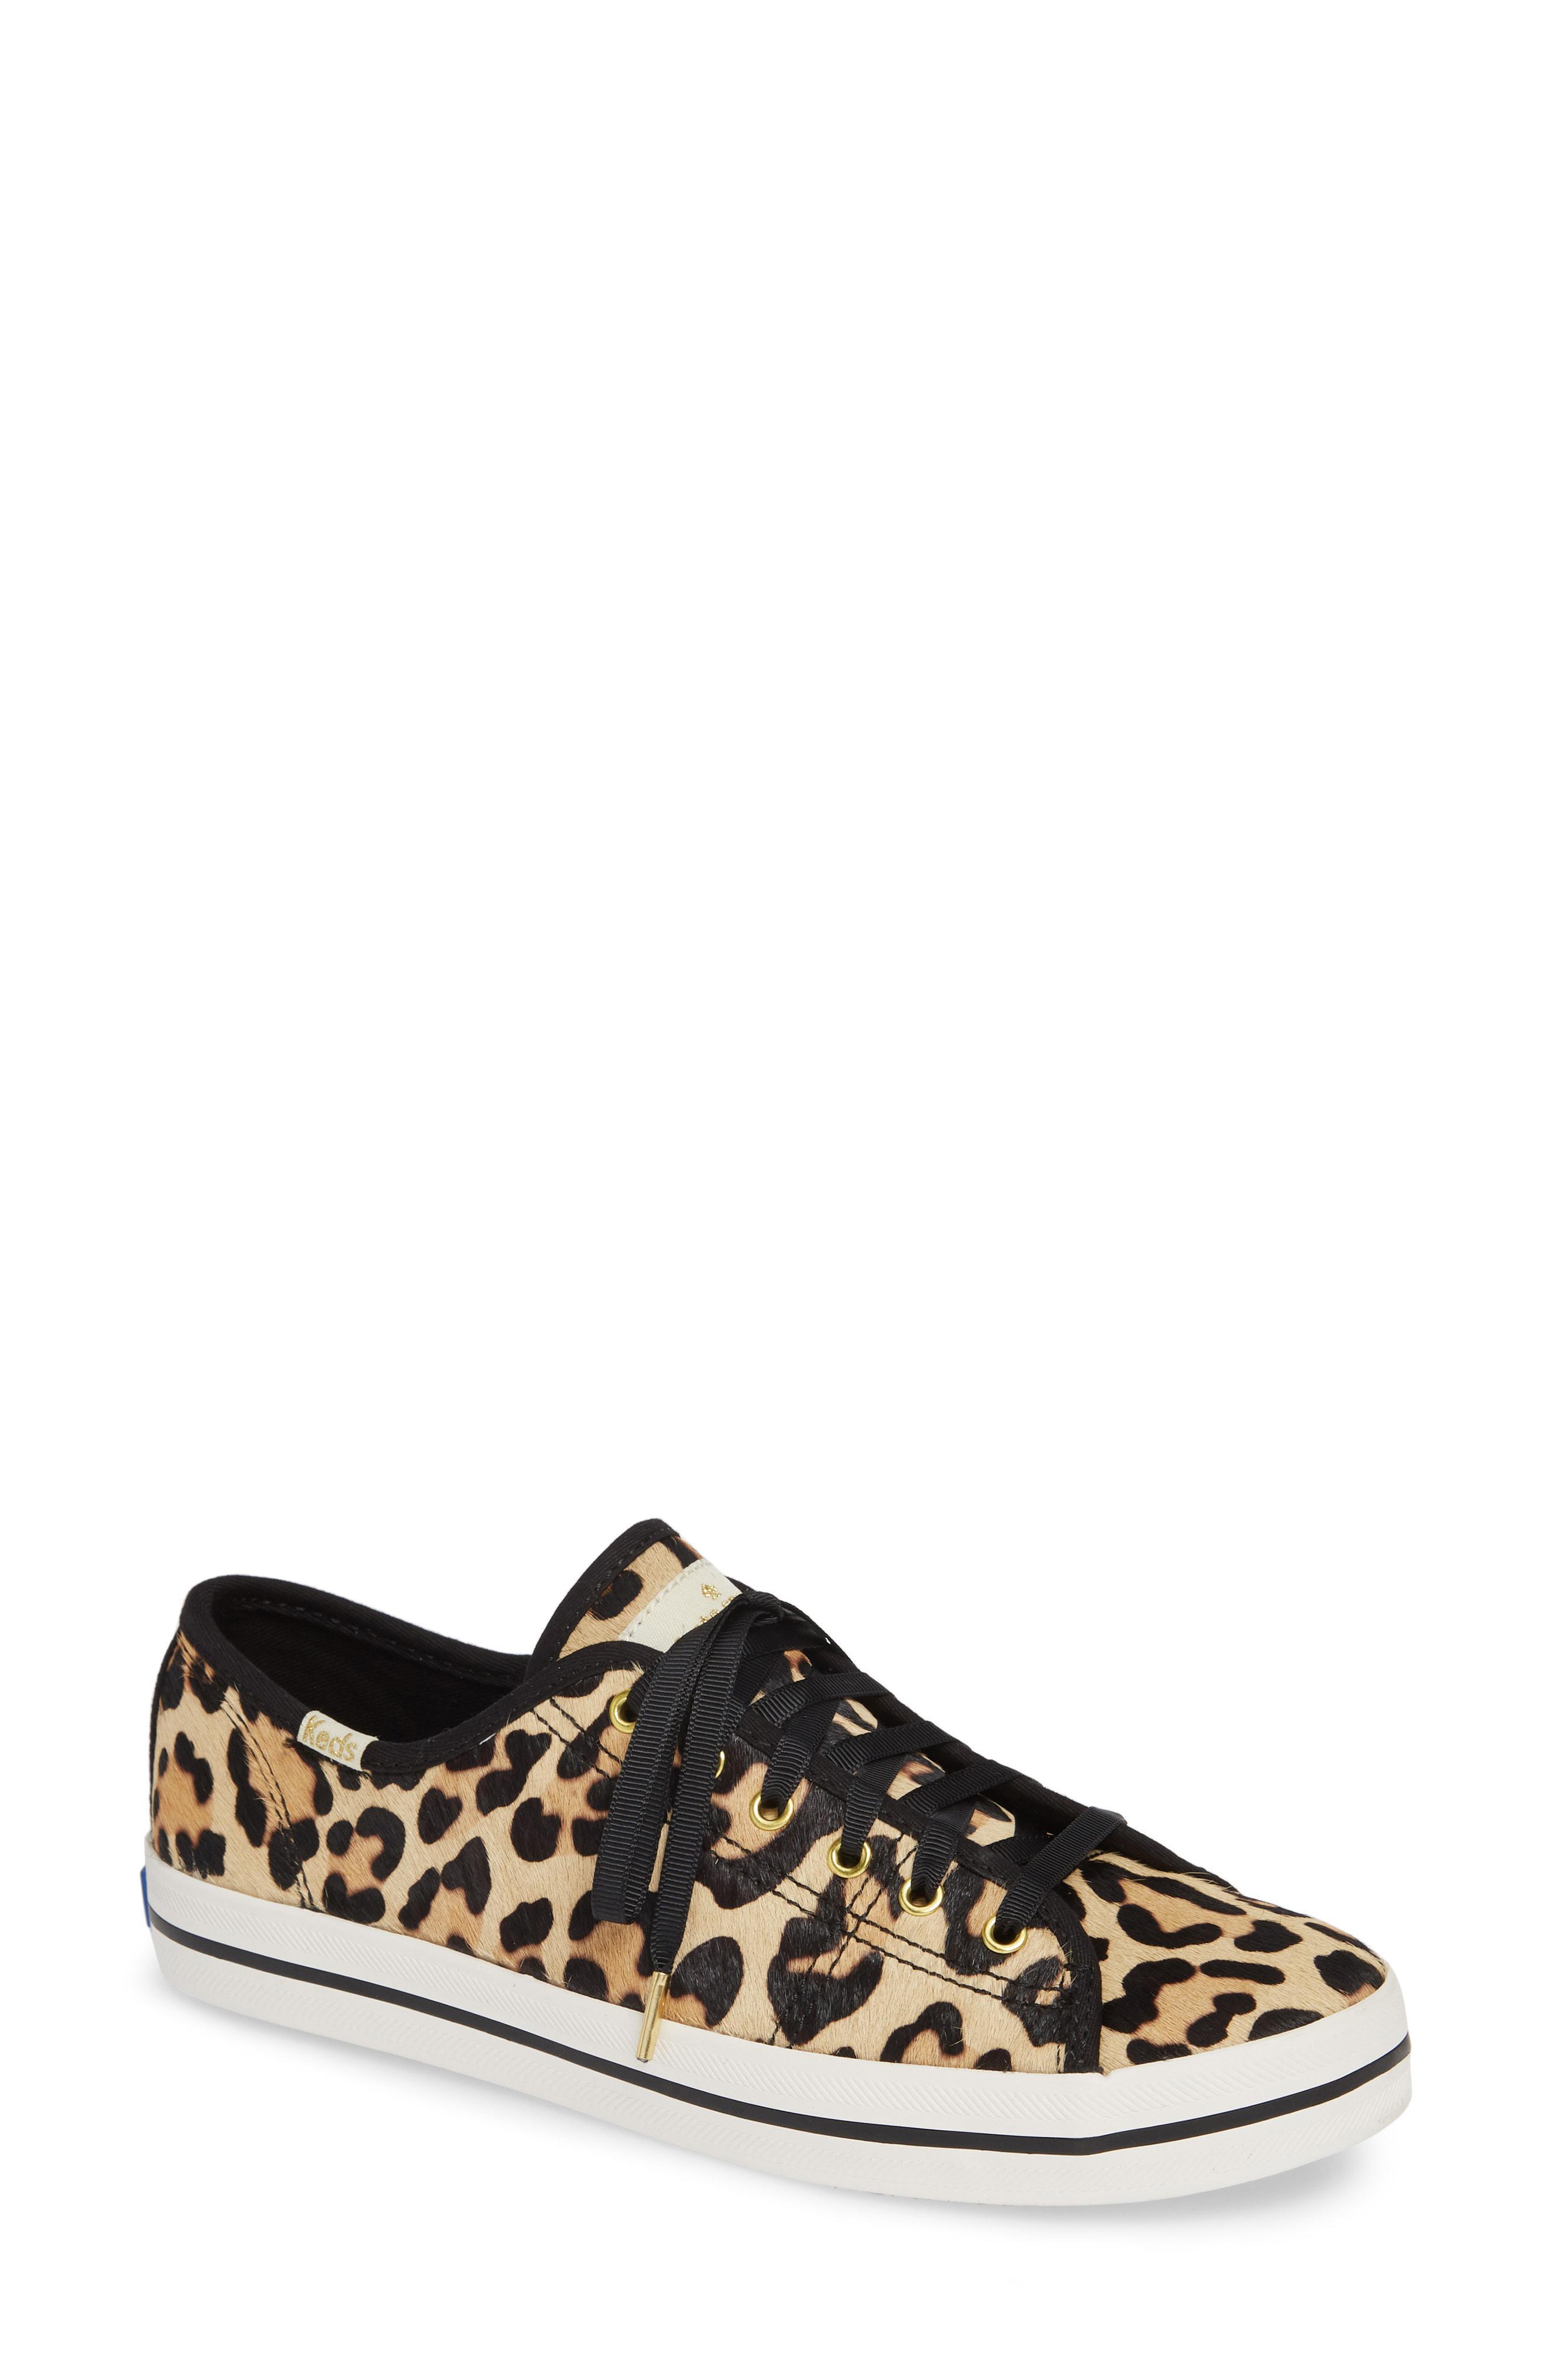 f8d357e6e20d Kate Spade Keds X New York Leopard-print Sneakers in Black - Save ...